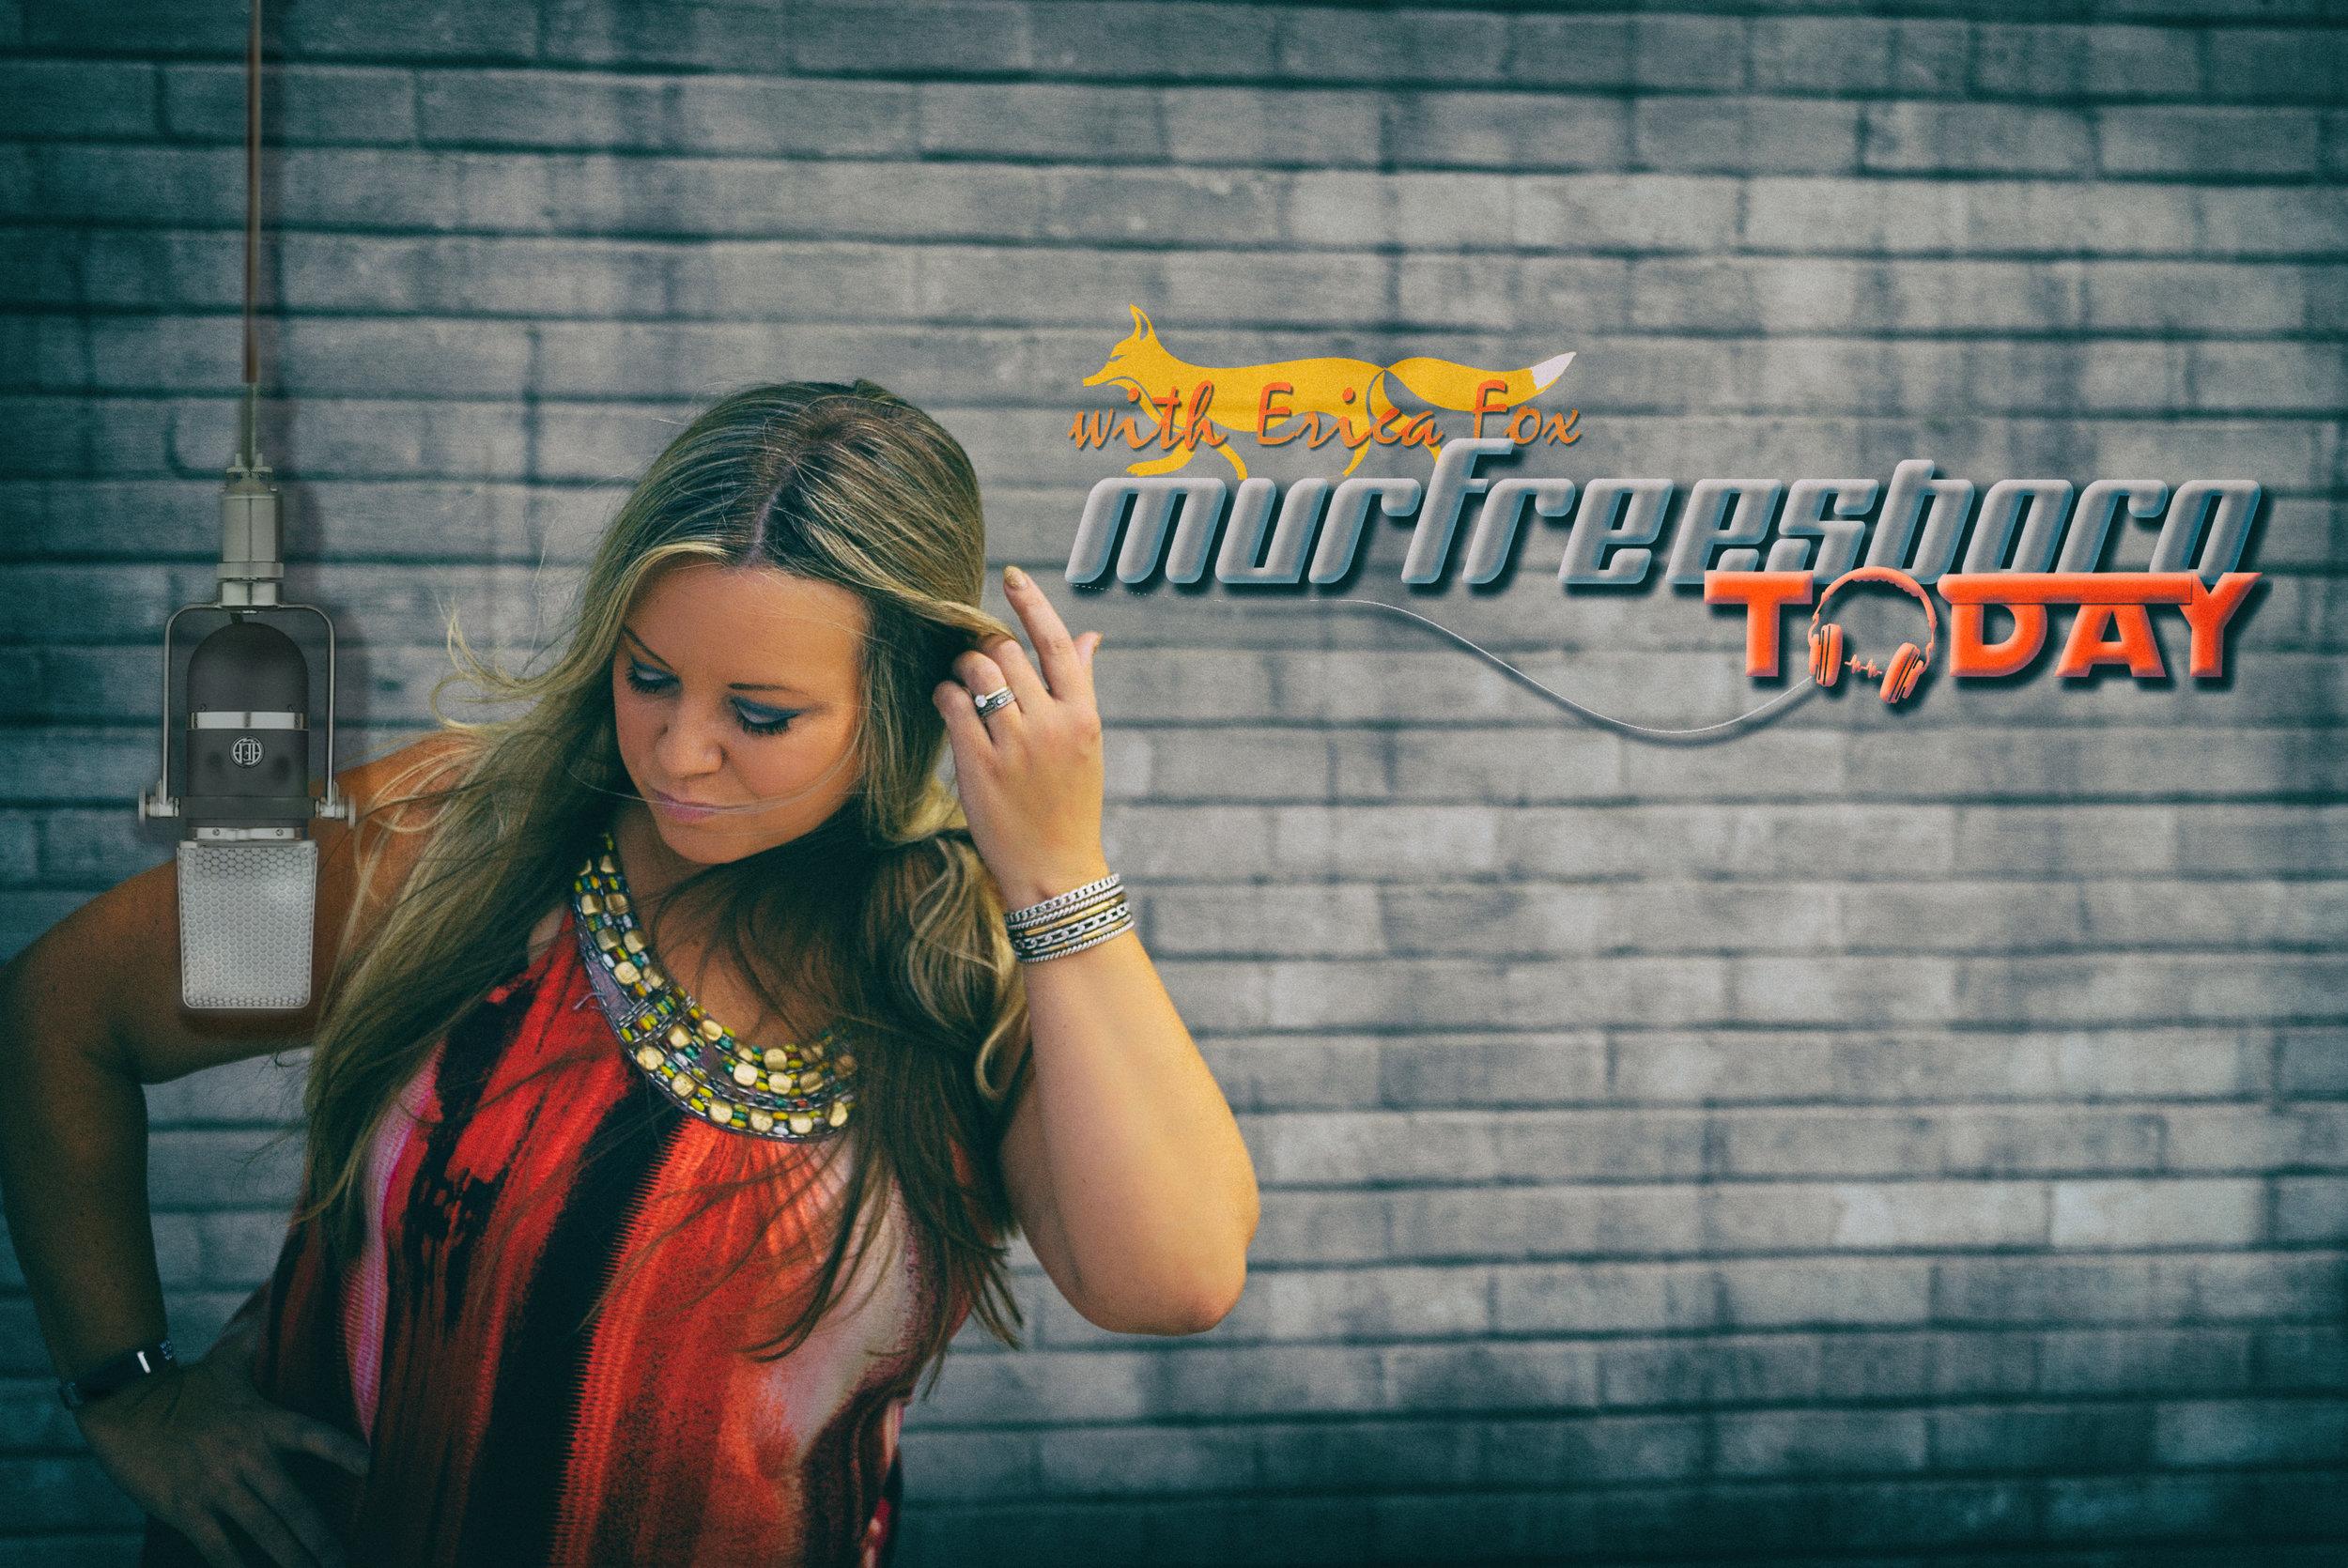 MurfreesboroToday.com Host Erica Fox